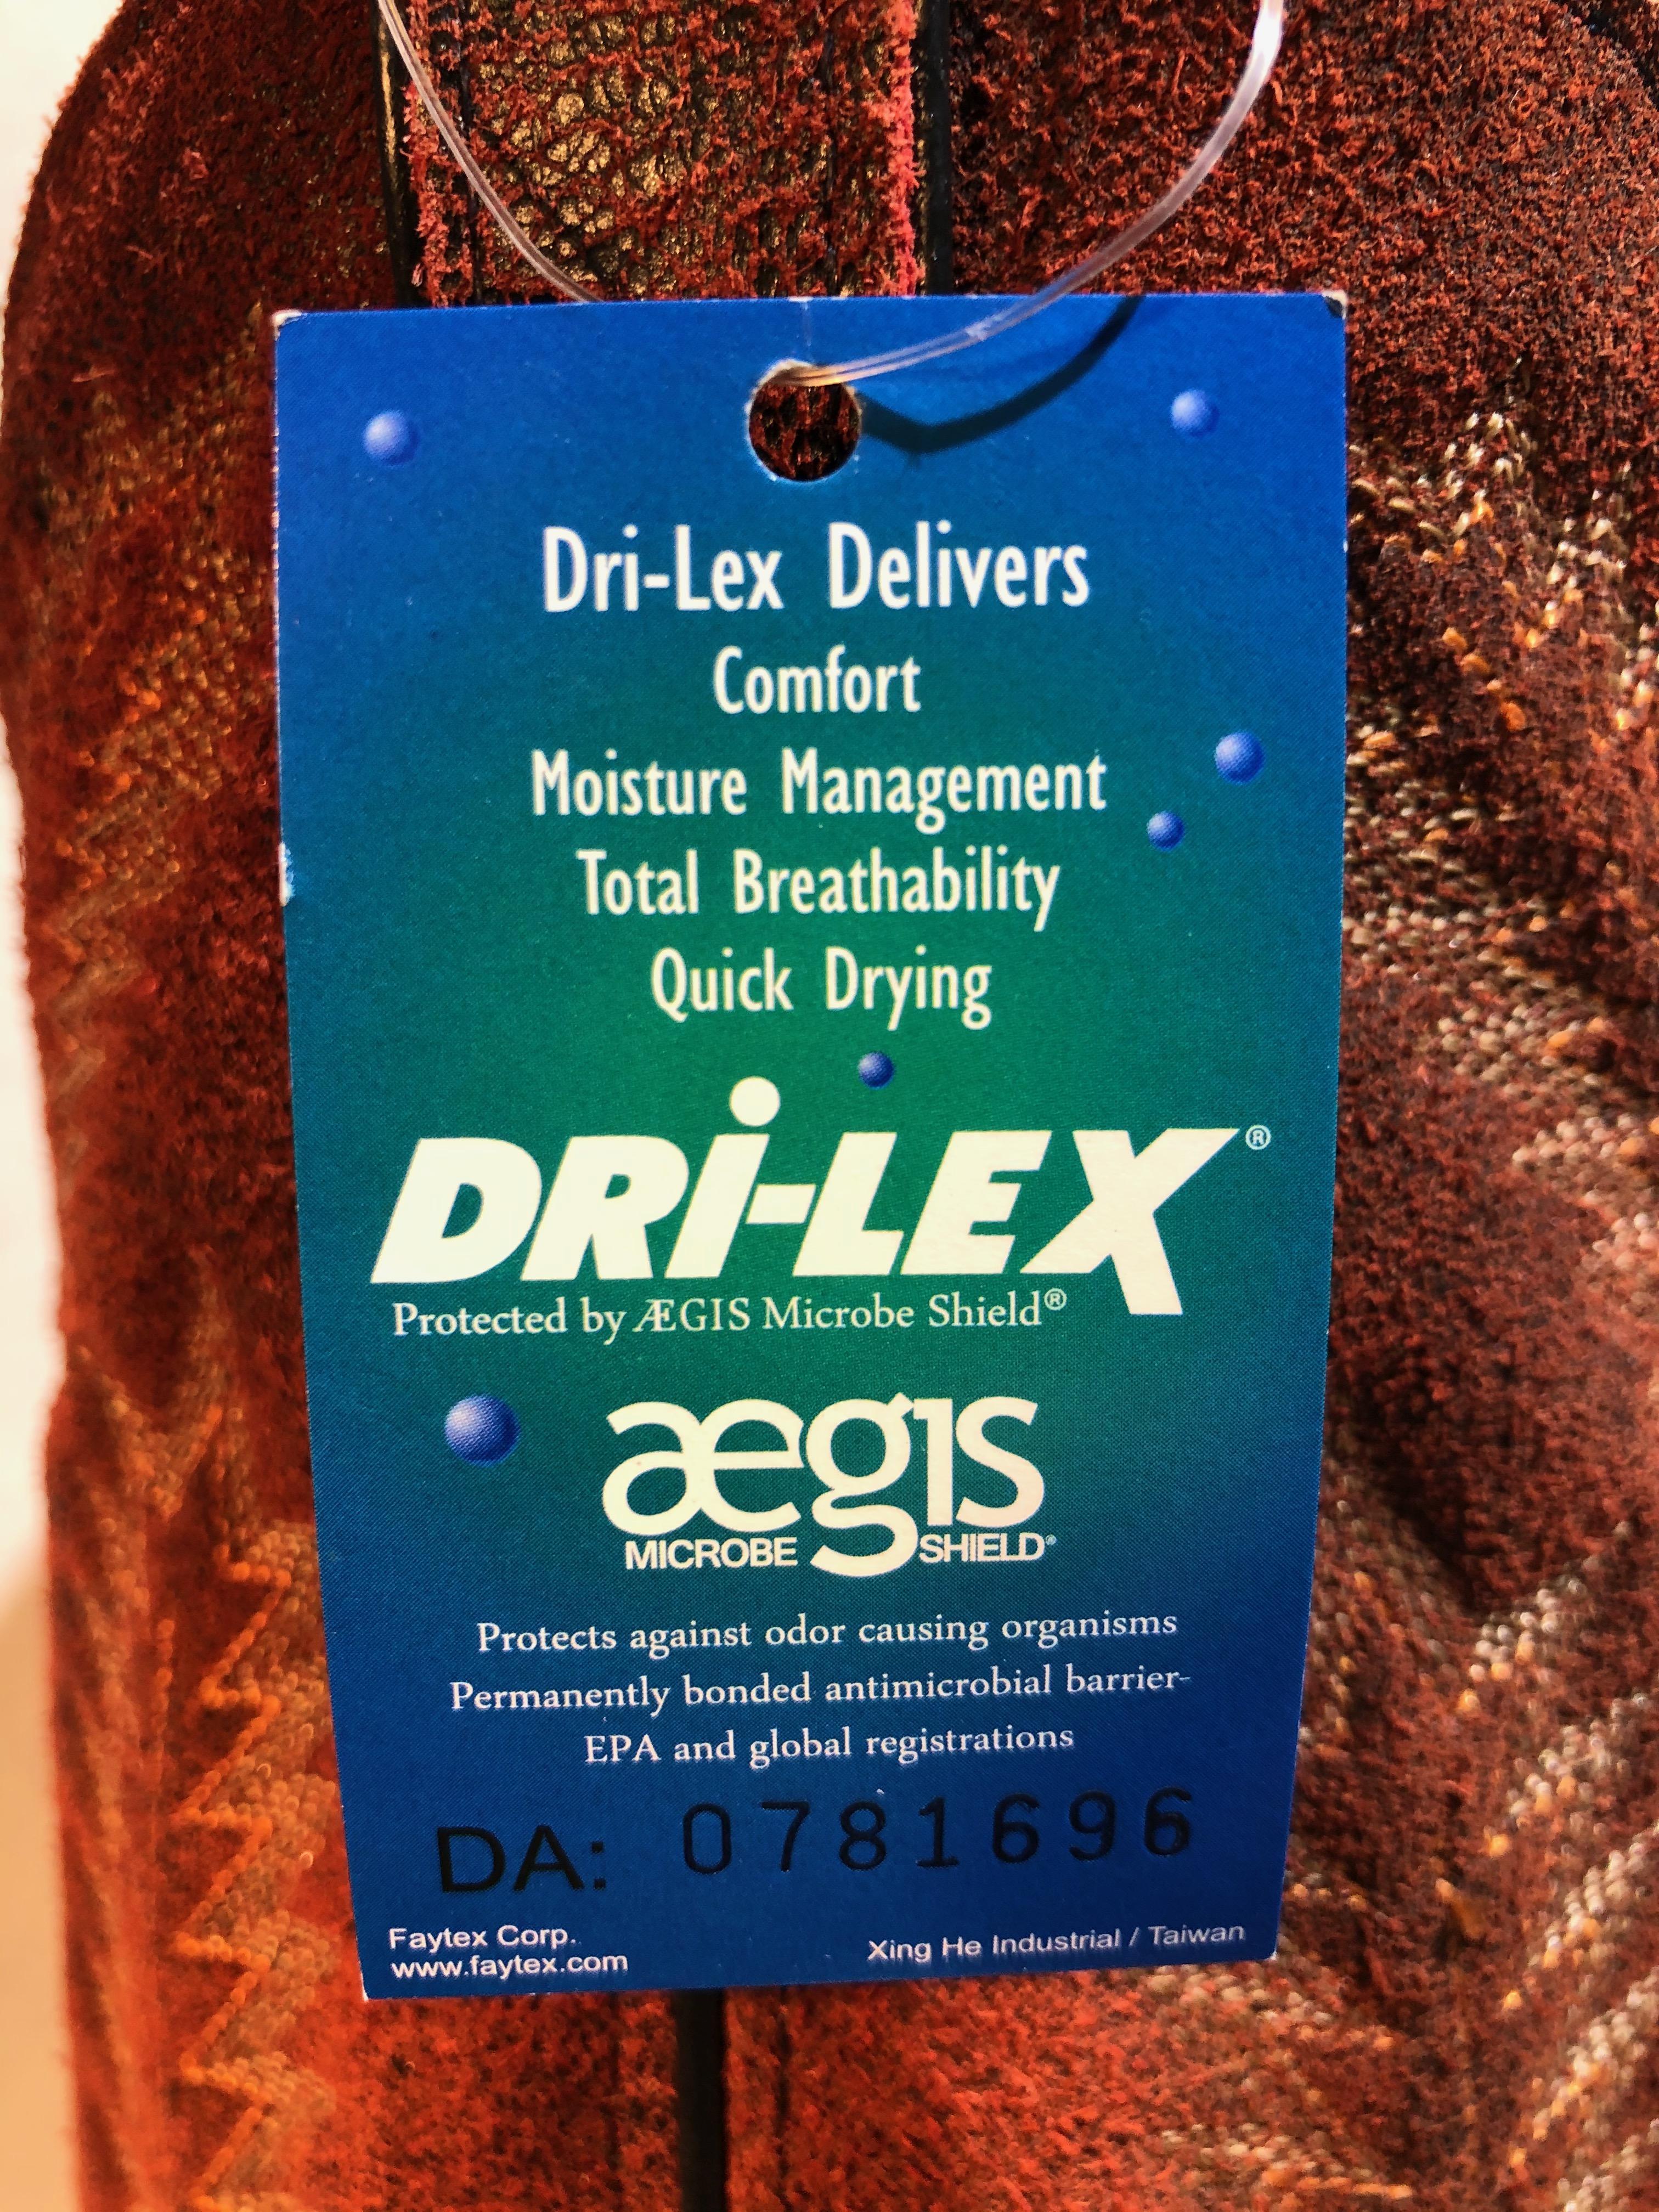 A506-DRI-LEX-back-label